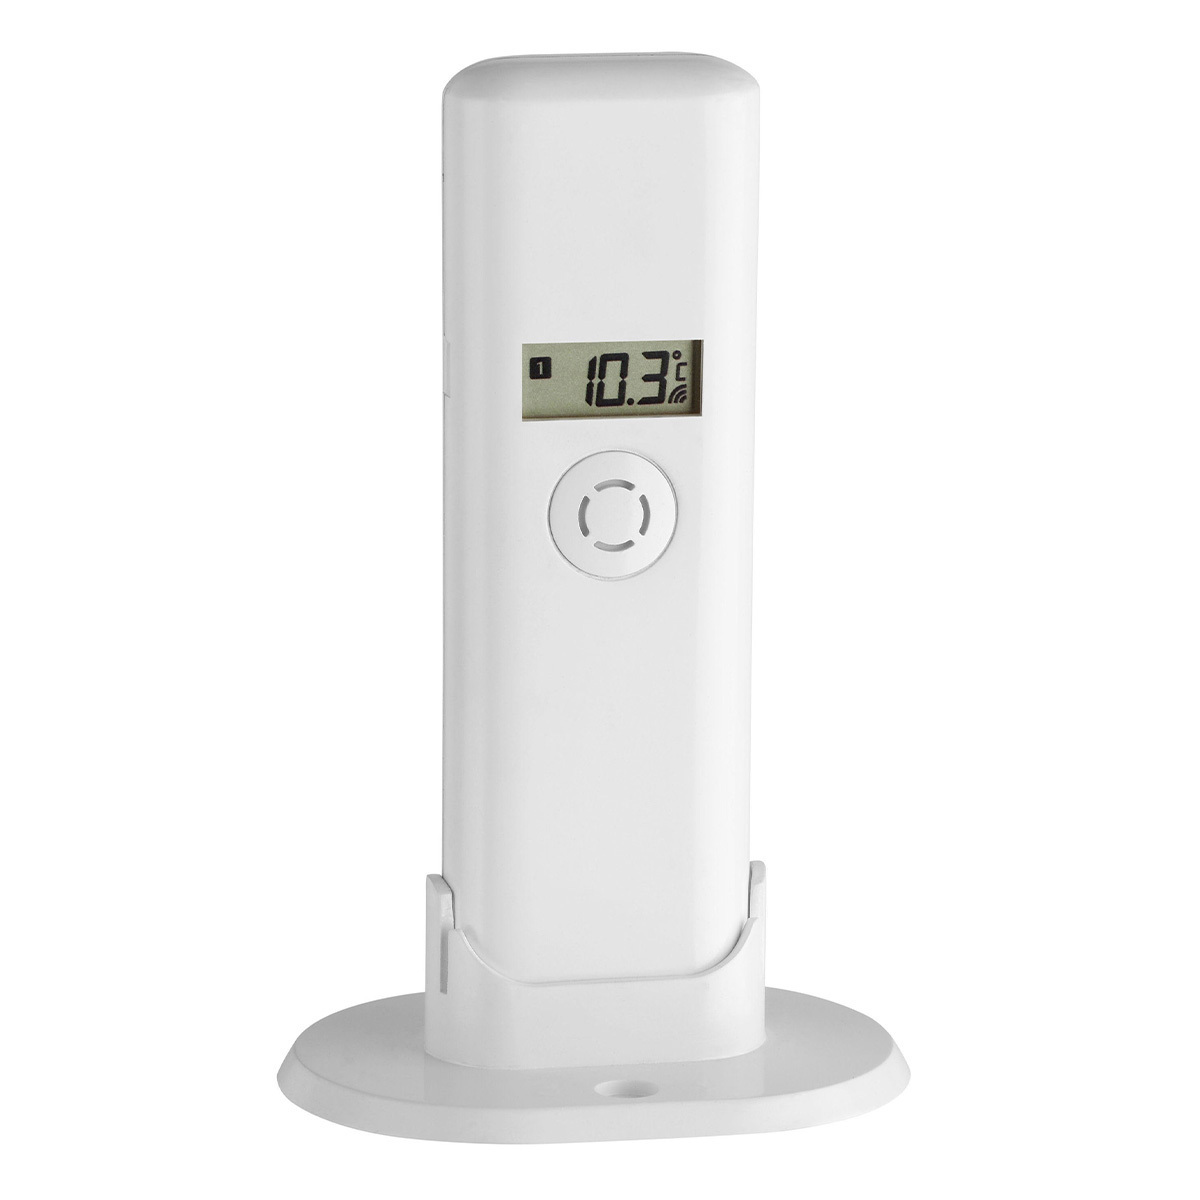 30-3143-it-temperatursender-1200x1200px.jpg